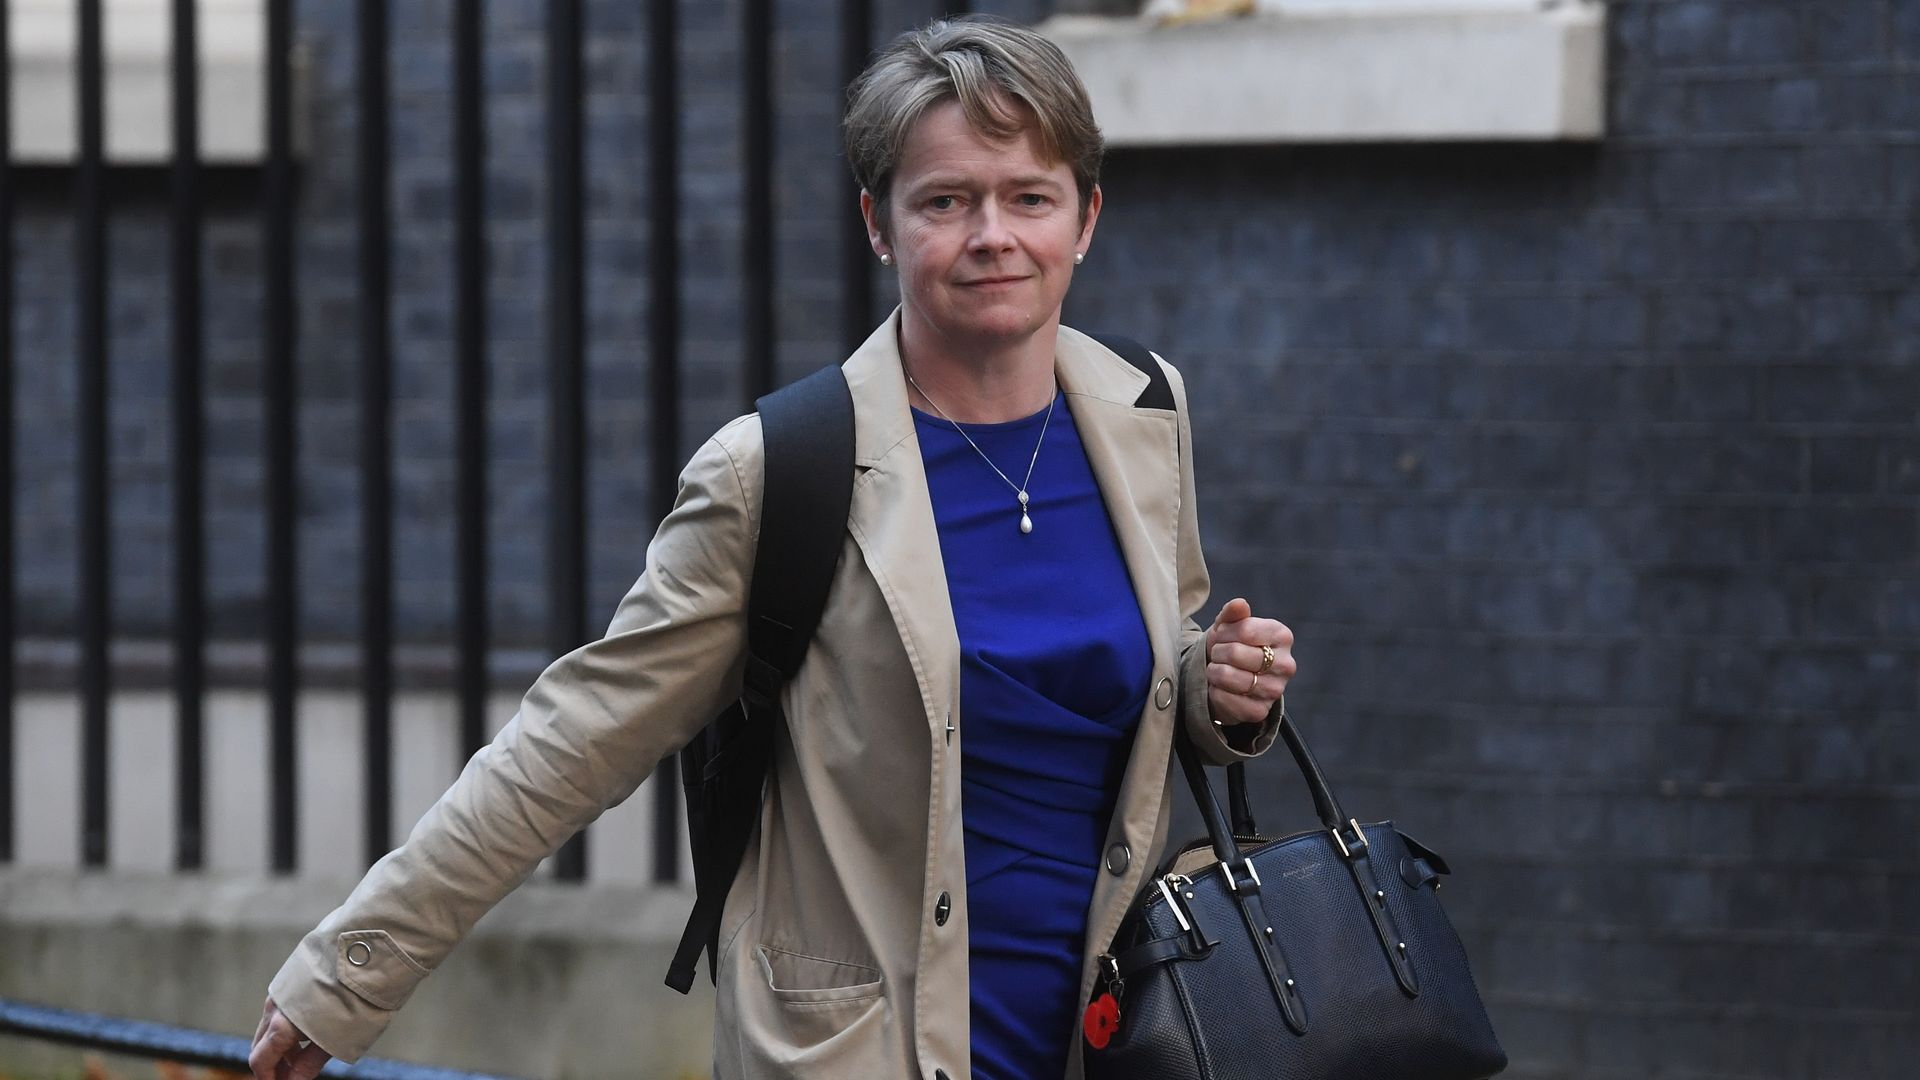 Baroness Dido Harding leaving Downing Street, London - Credit: PA